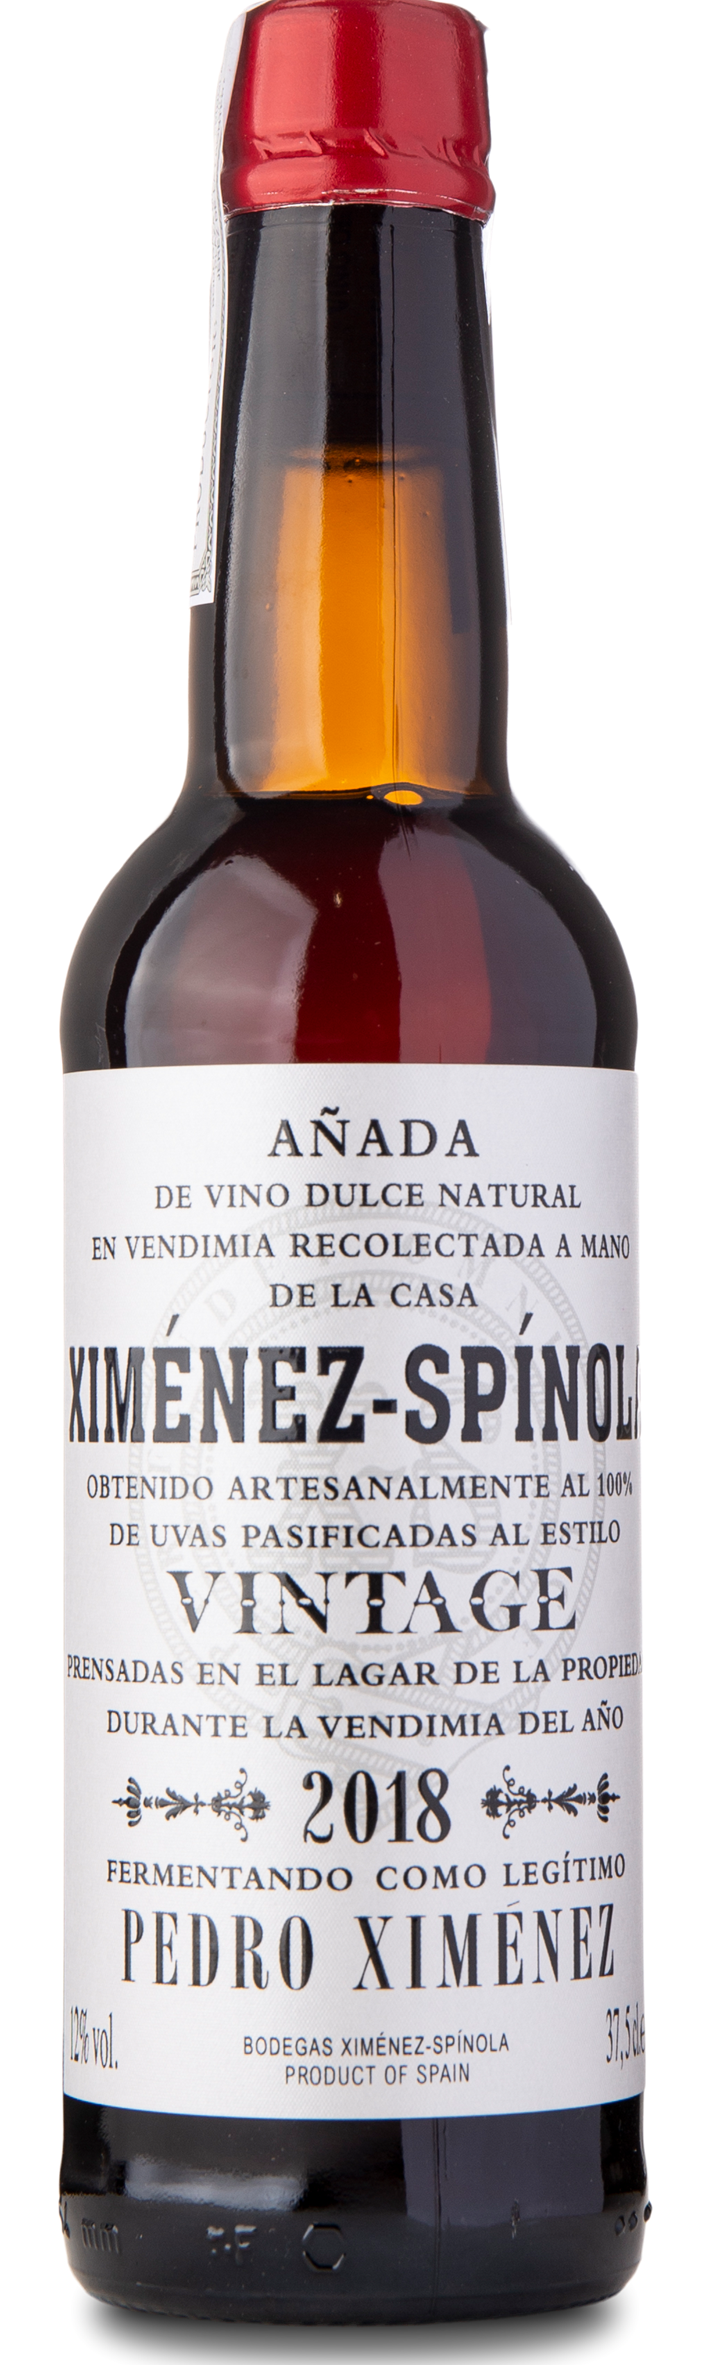 2018 Ximenex-Spinola PX Vintage, 3/8 ltr.